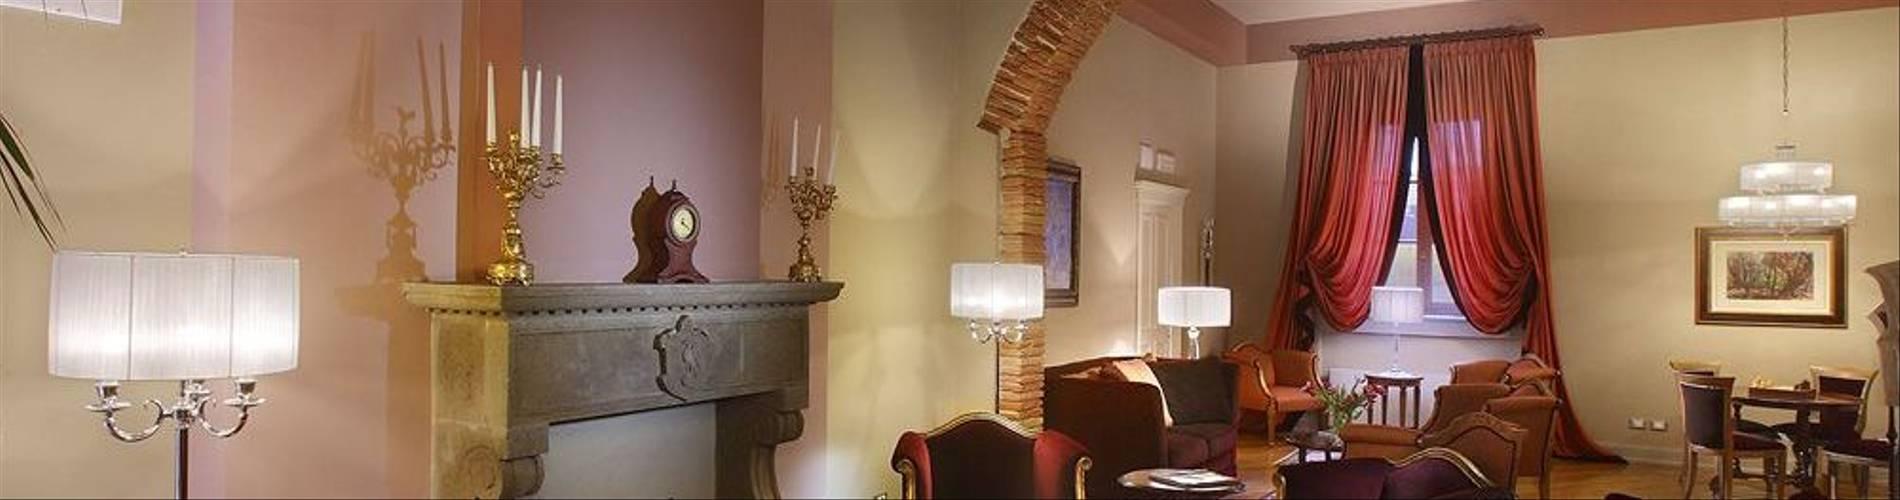 05-Hotel San Luca Palace.jpg